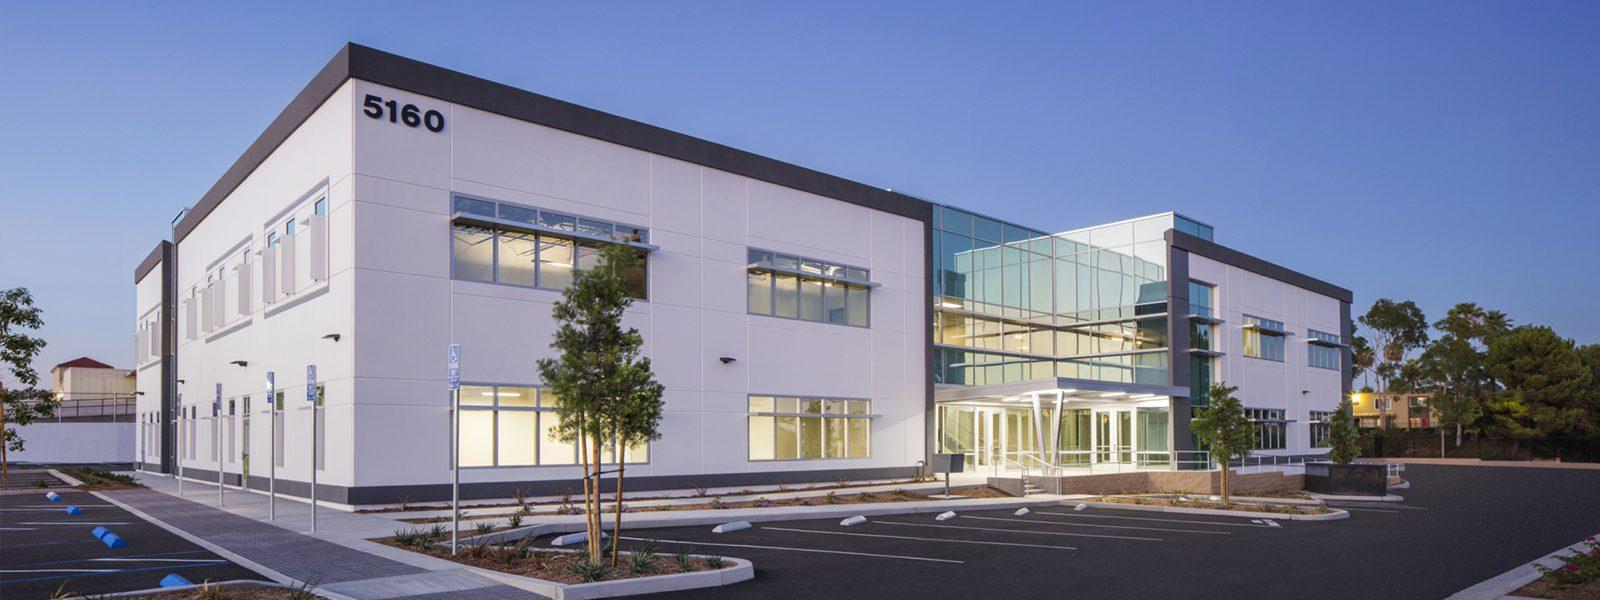 San Diego Architecture | Ware Malcomb San Diego